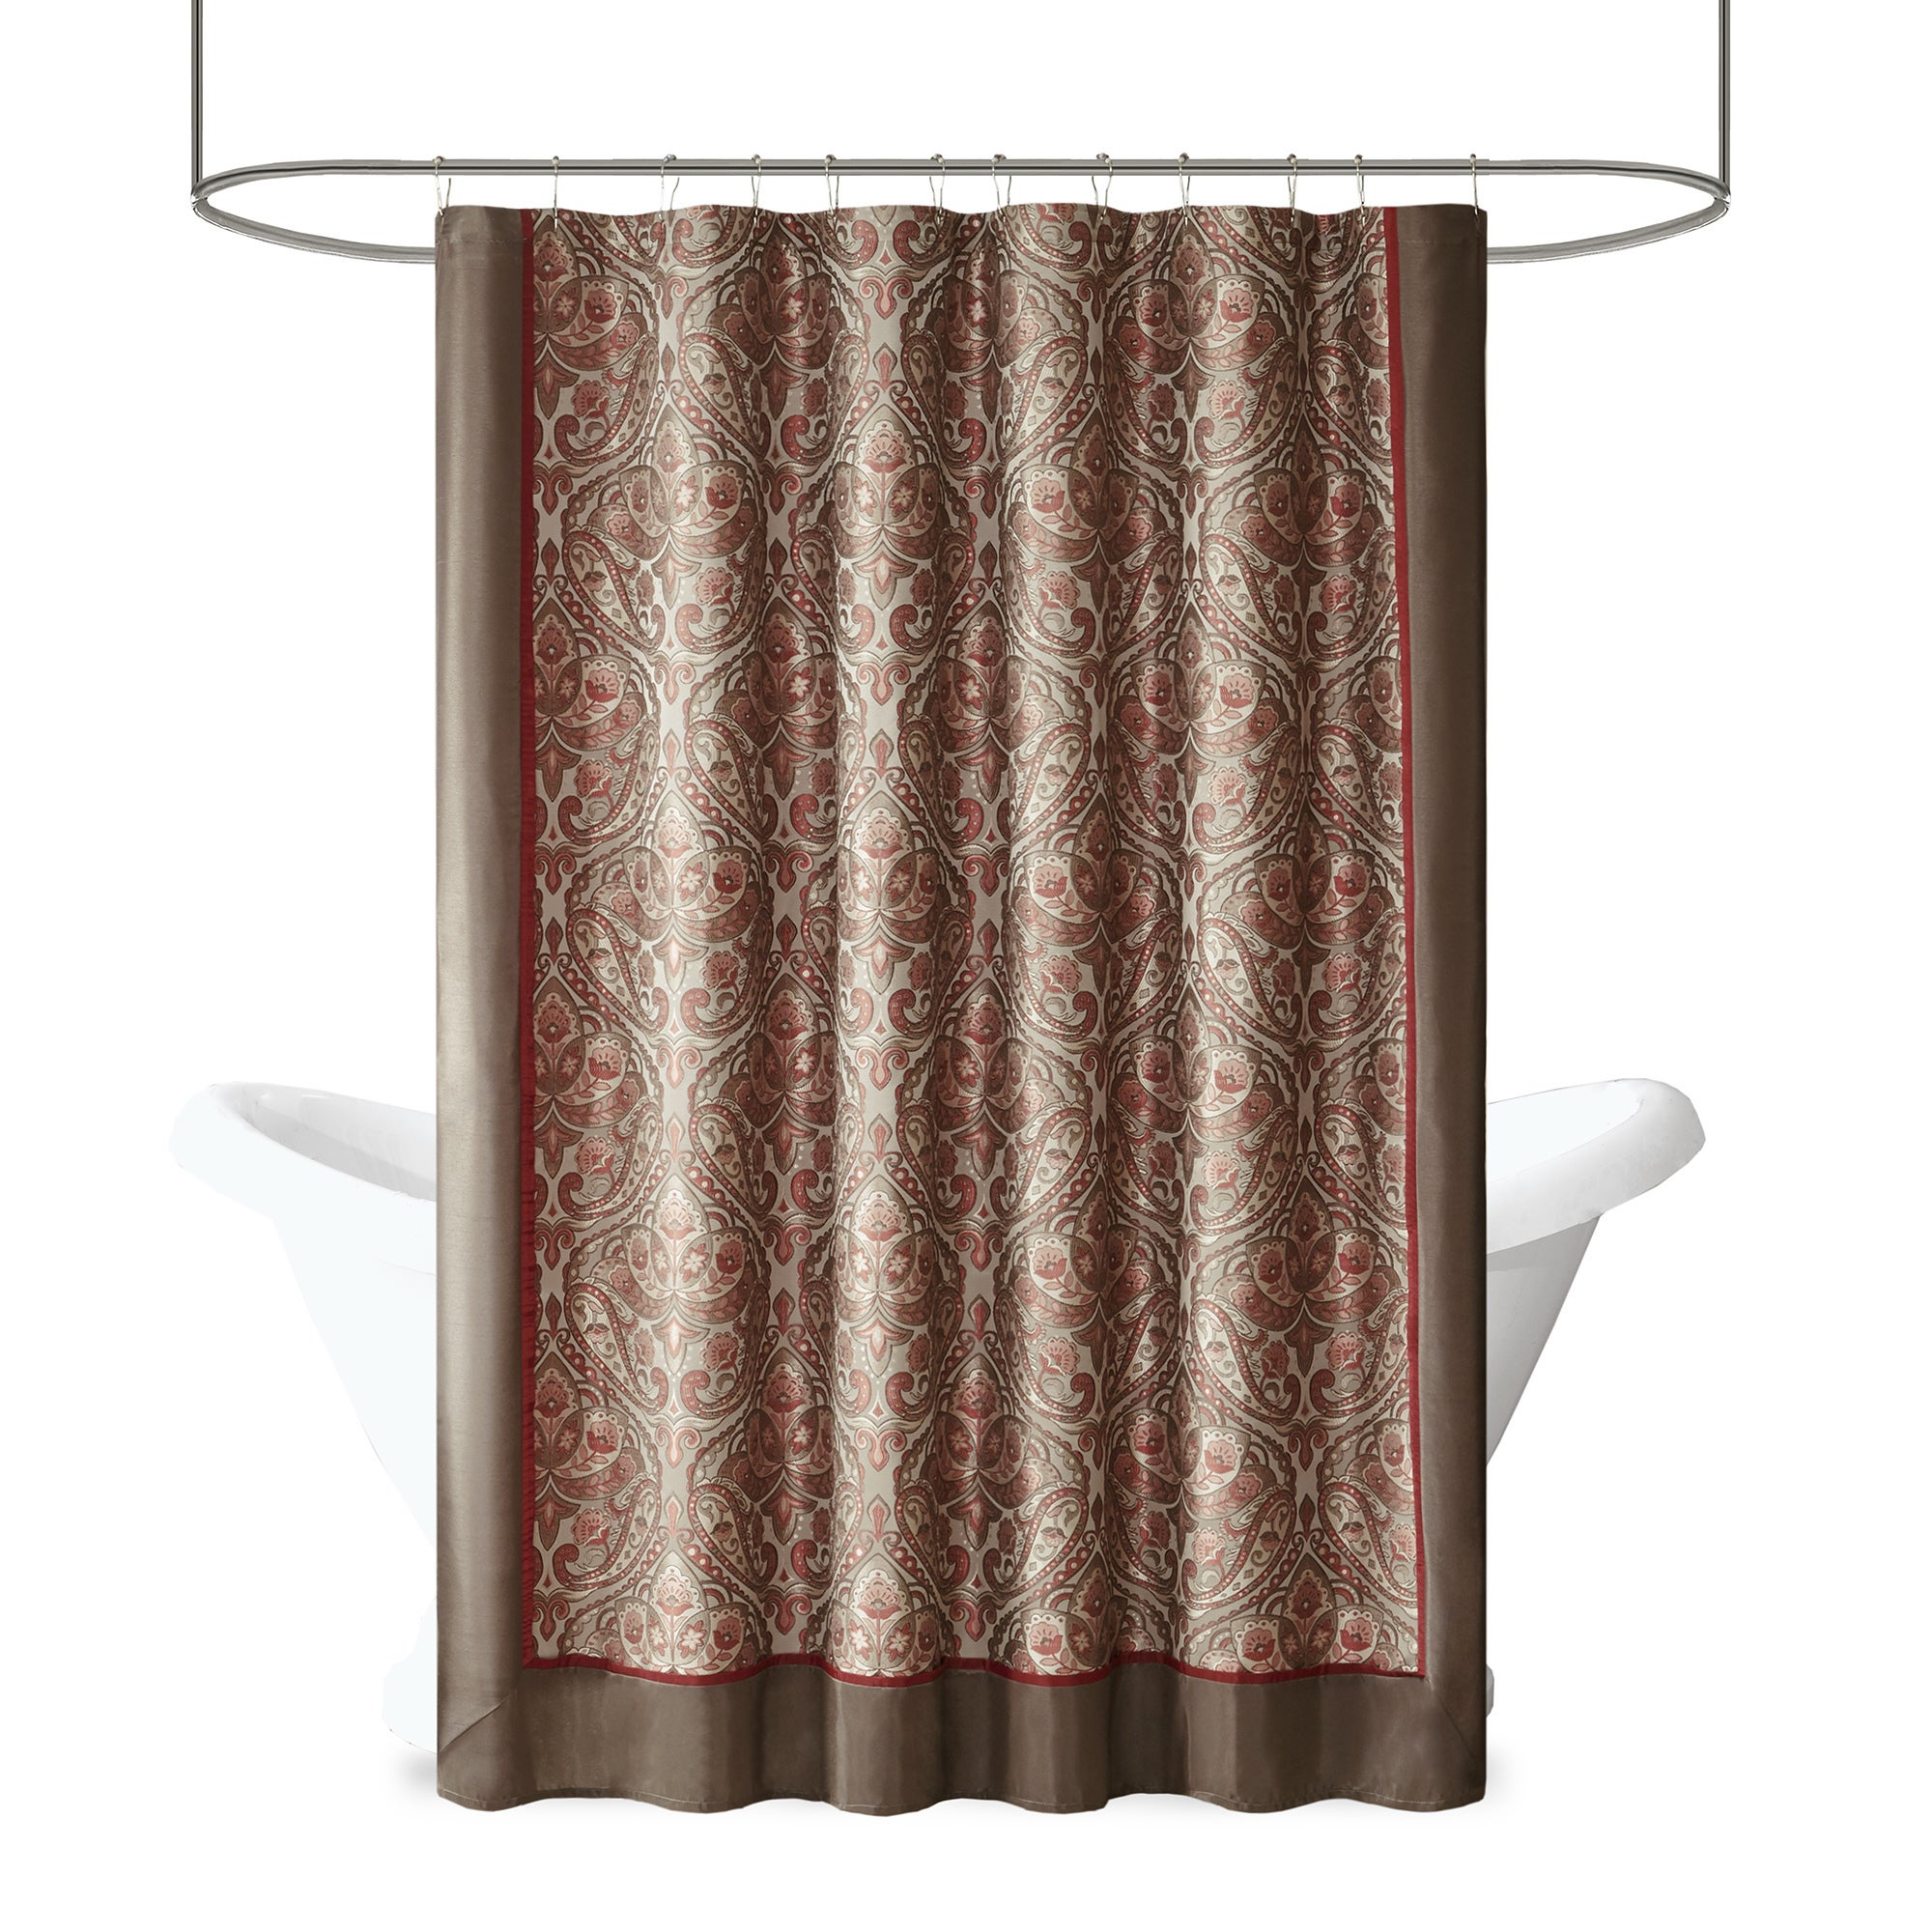 Shop Madison Park Preston Redbrown Jacquard Shower Curtain Free